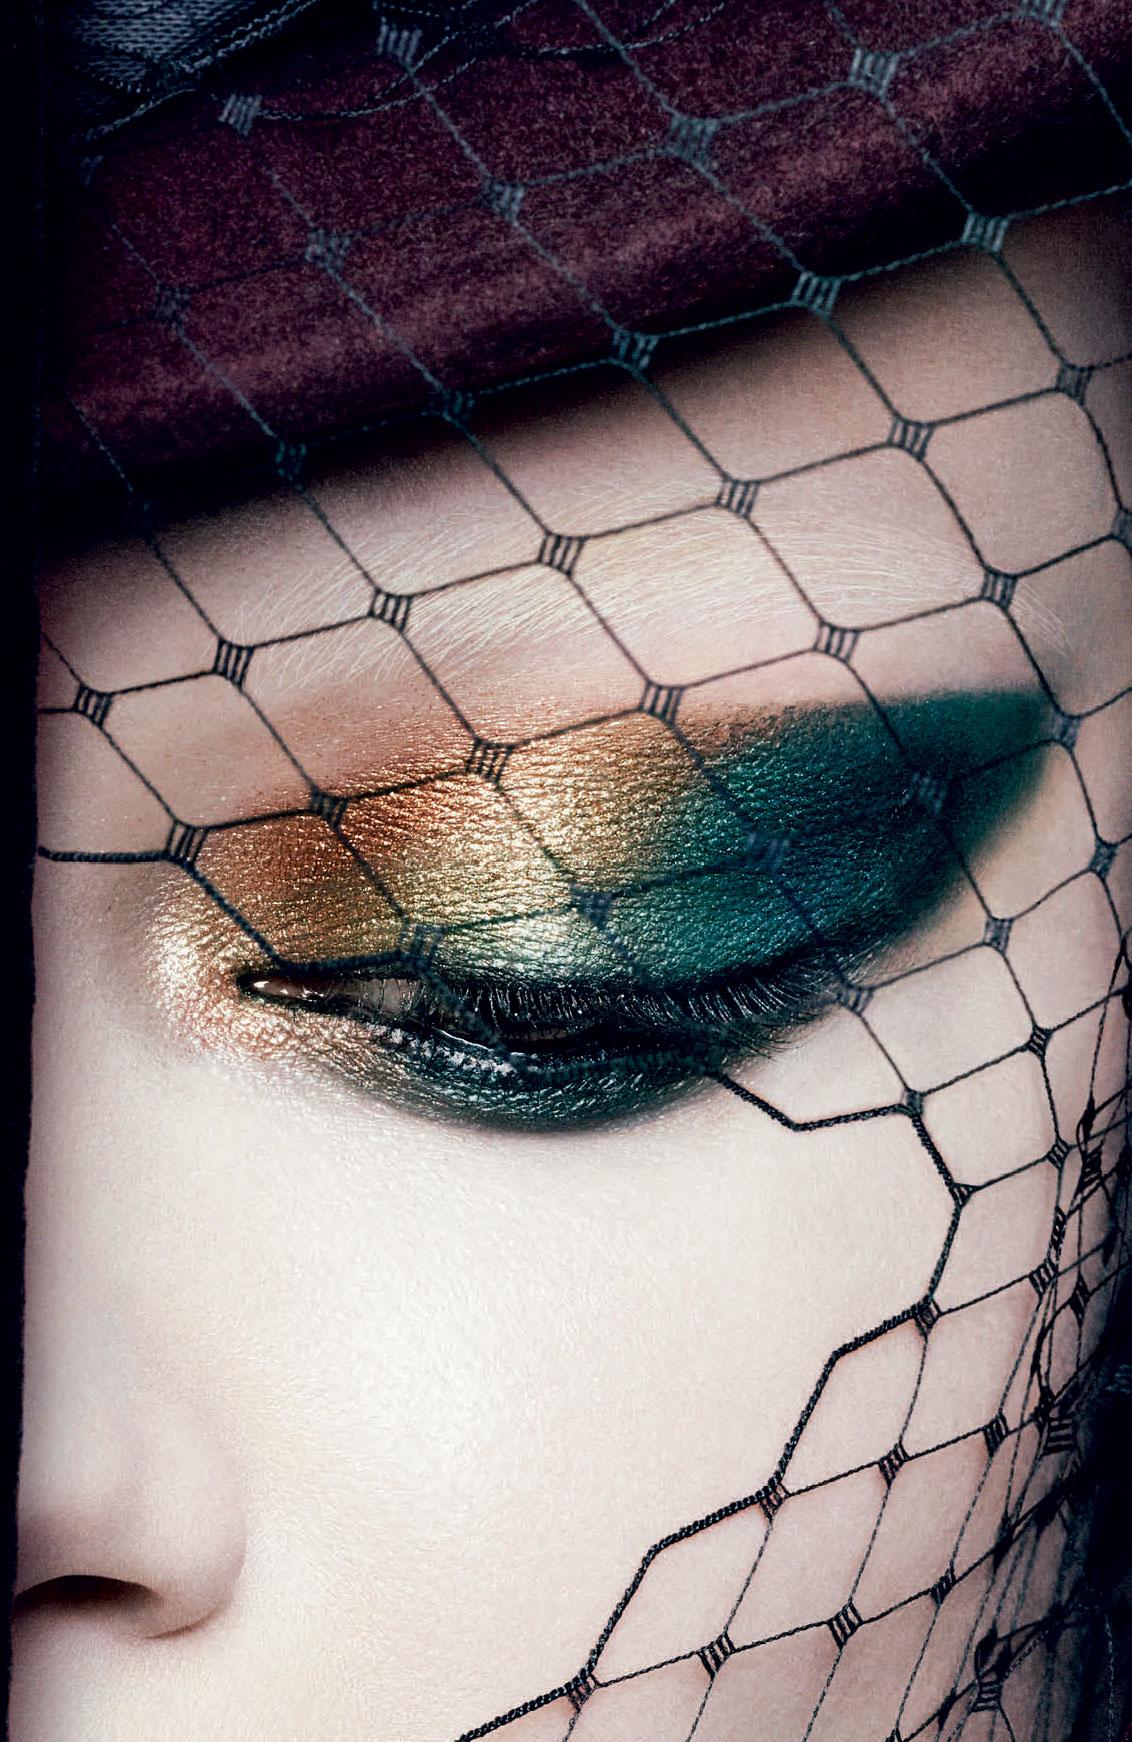 spellbinder_beauty_cmyk_300